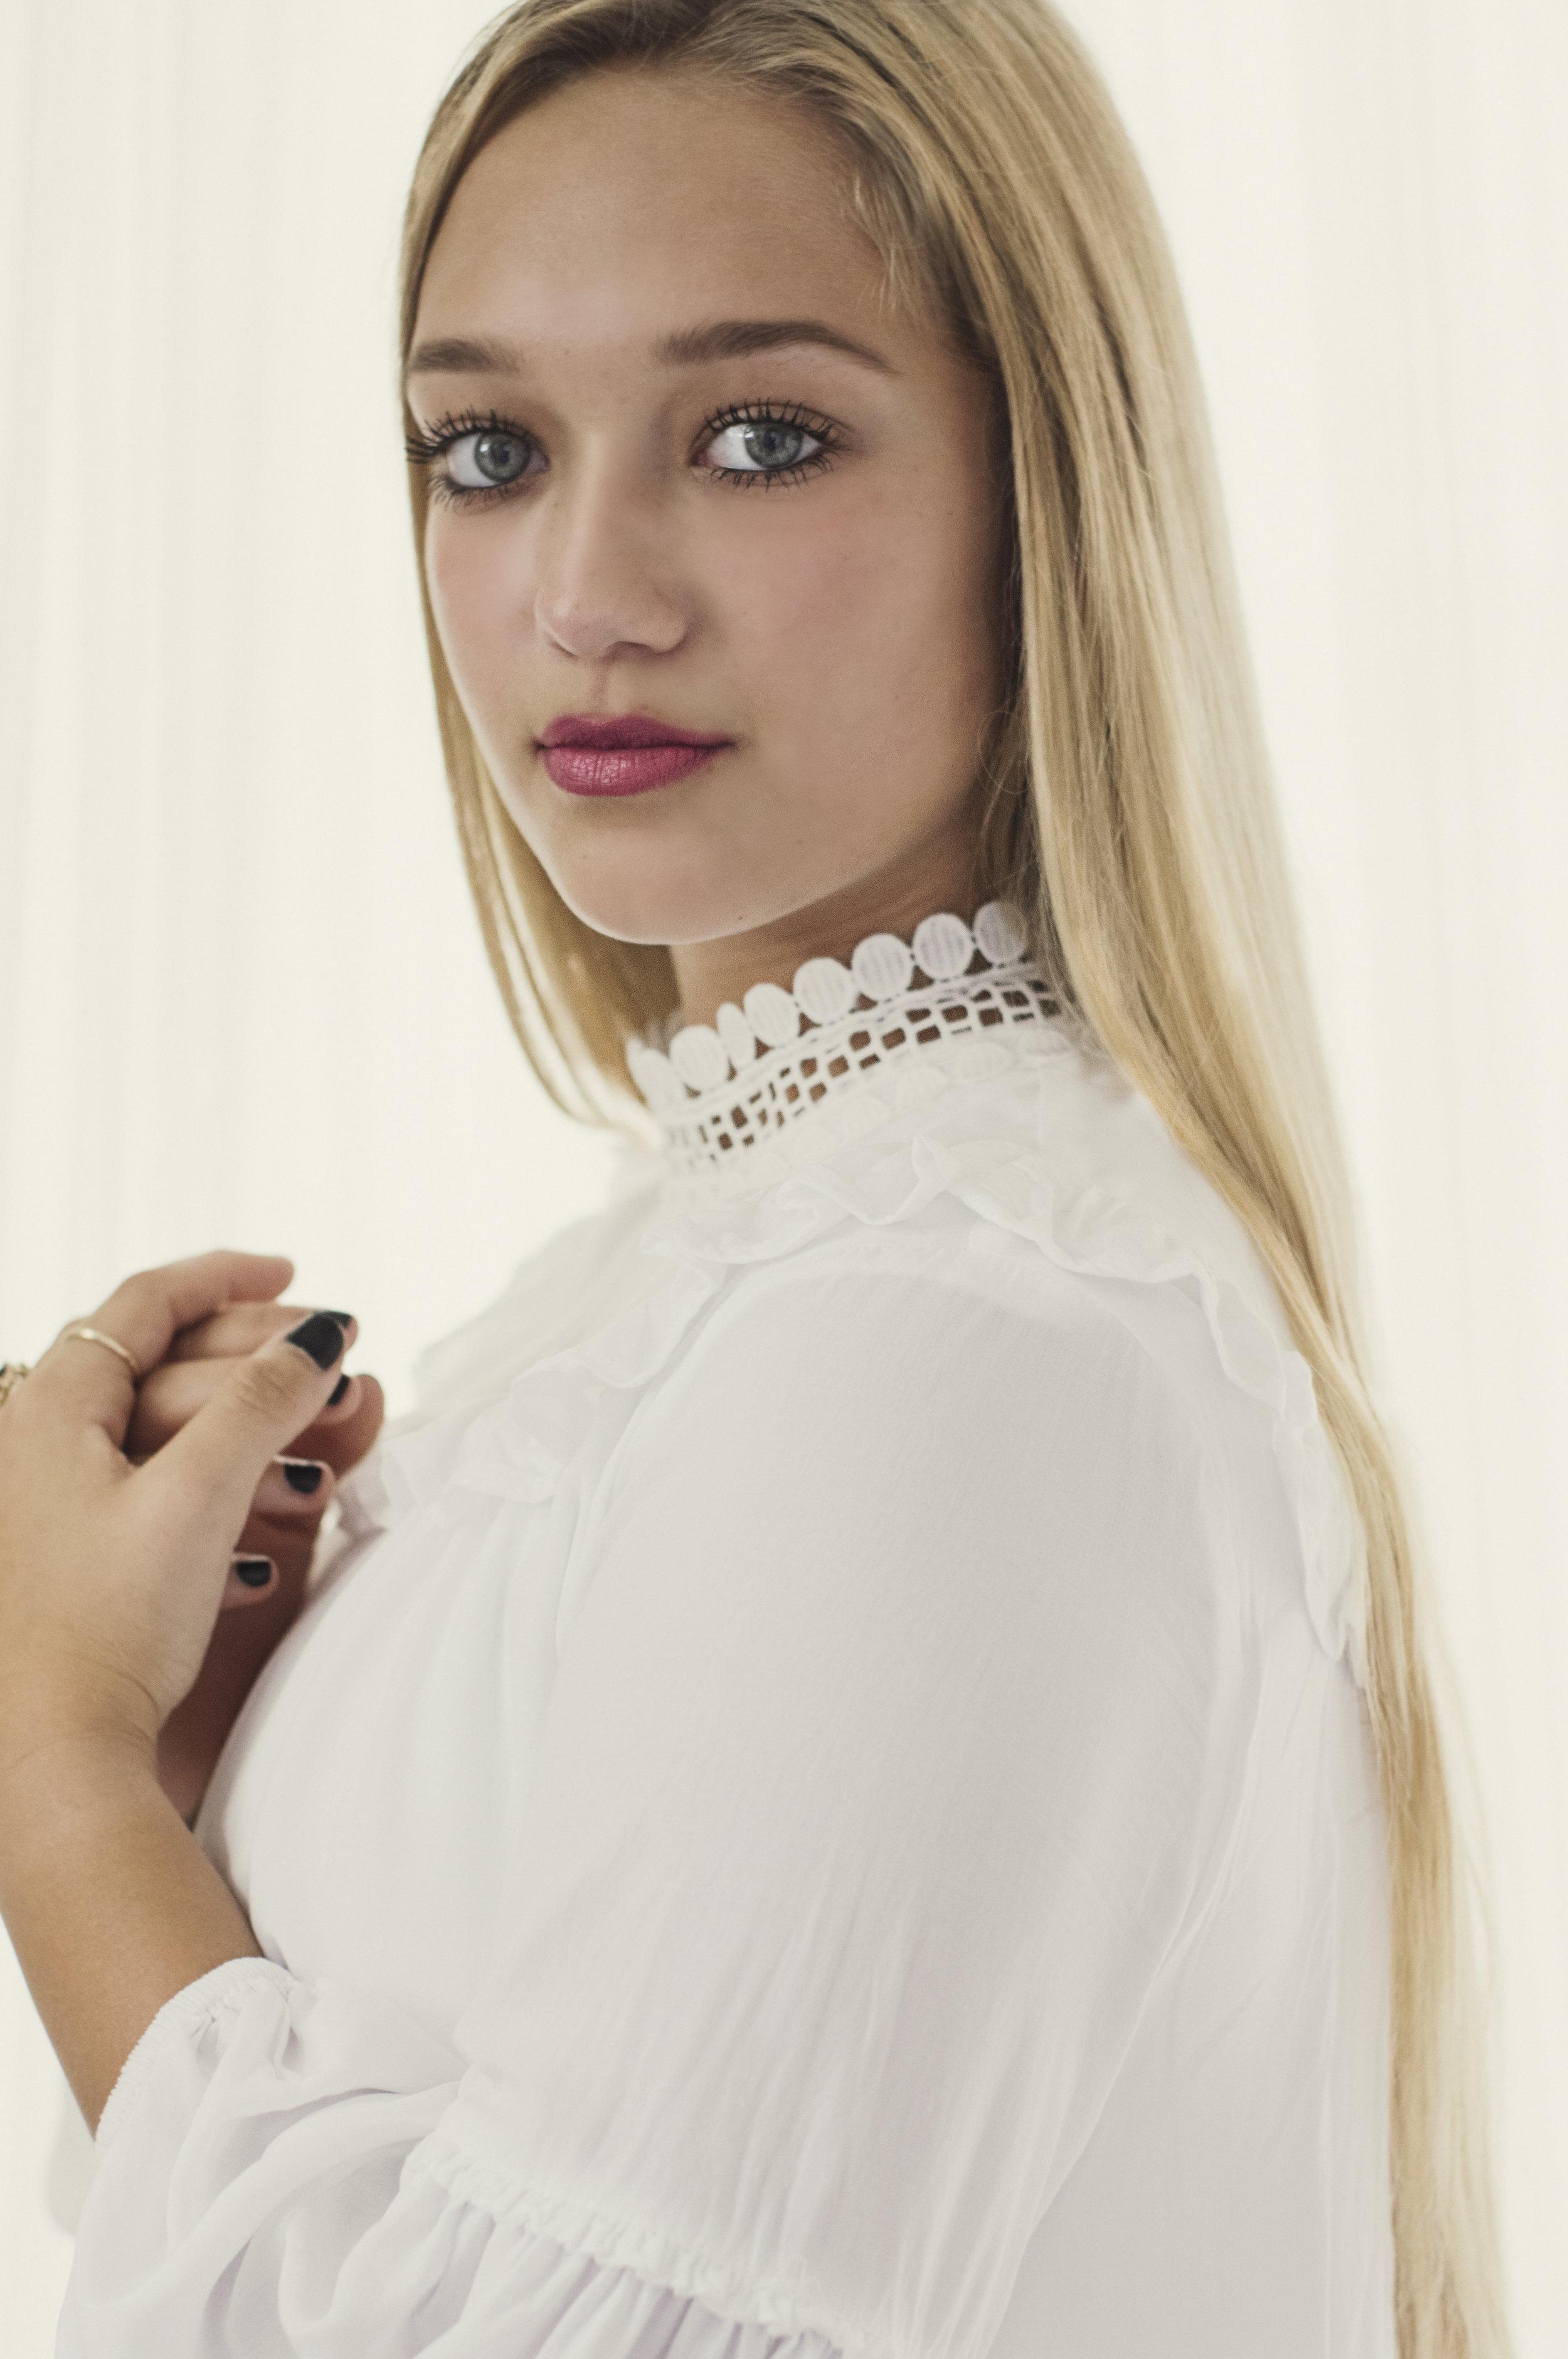 Heirloom Portrait of a Teenaged Girl